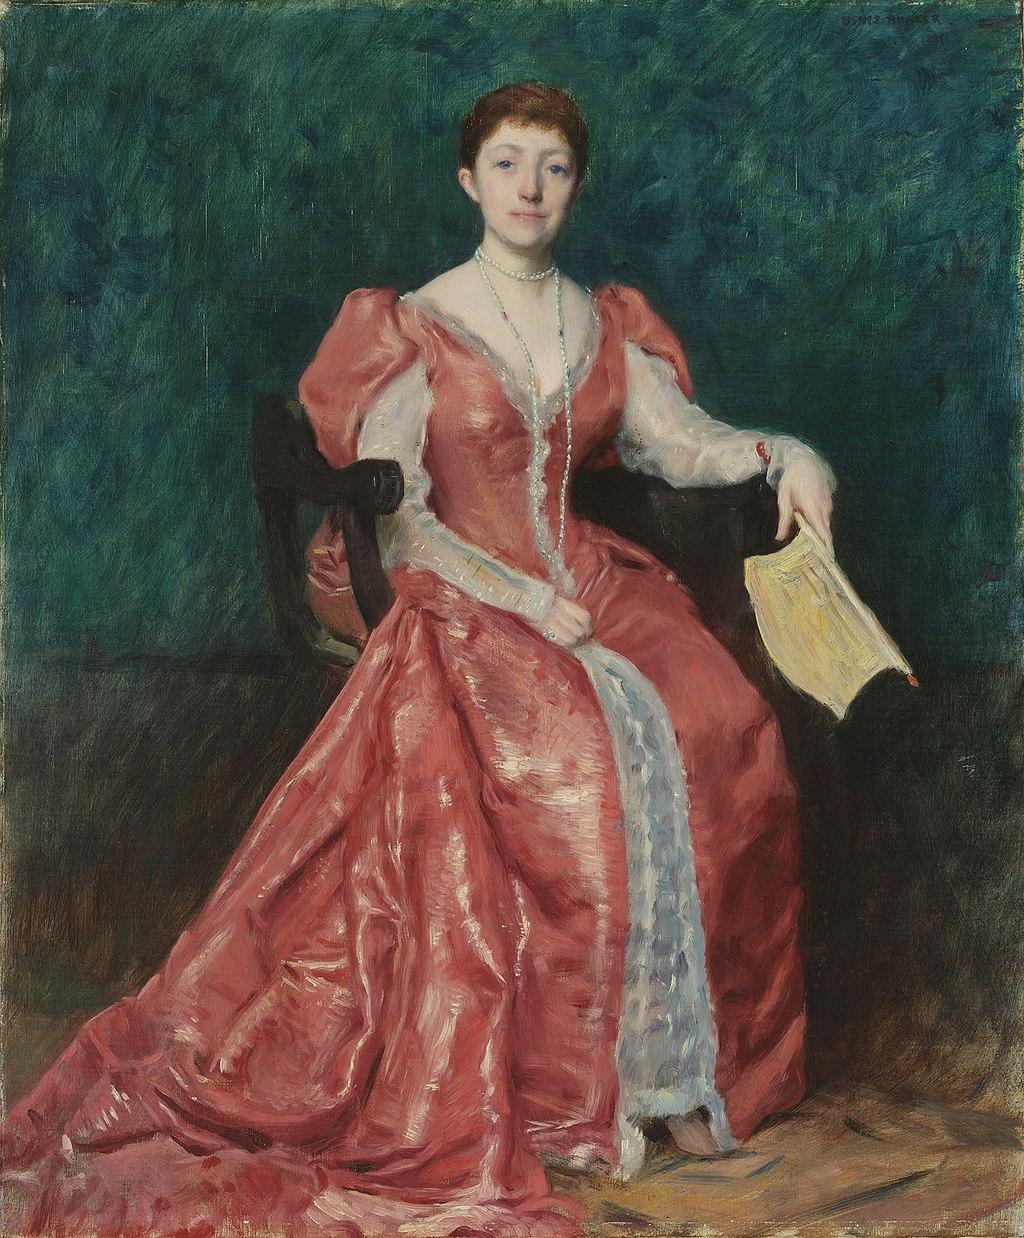 Painting of Isabella Stewart Gardner by Dennis Miller Bunker